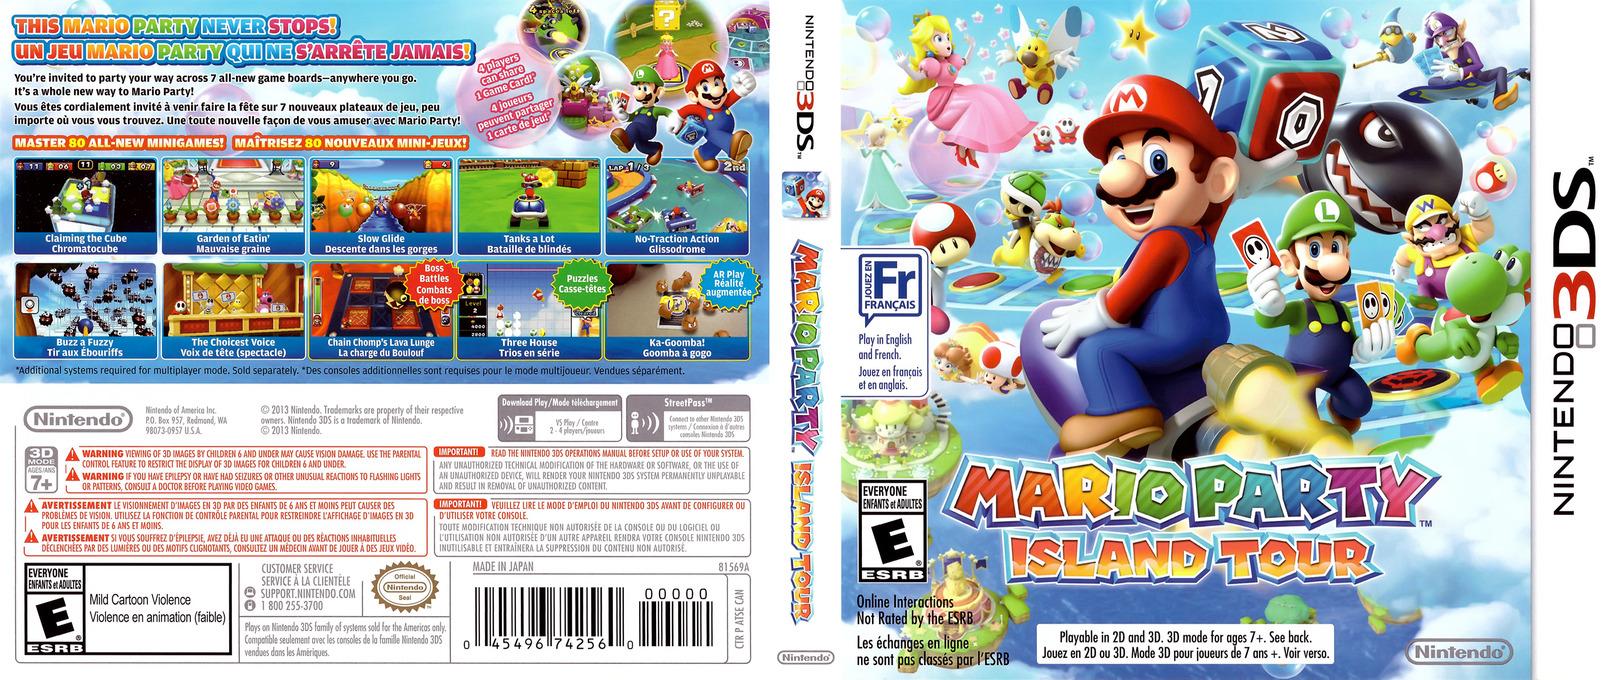 Mario Party Island Tour Party Mode